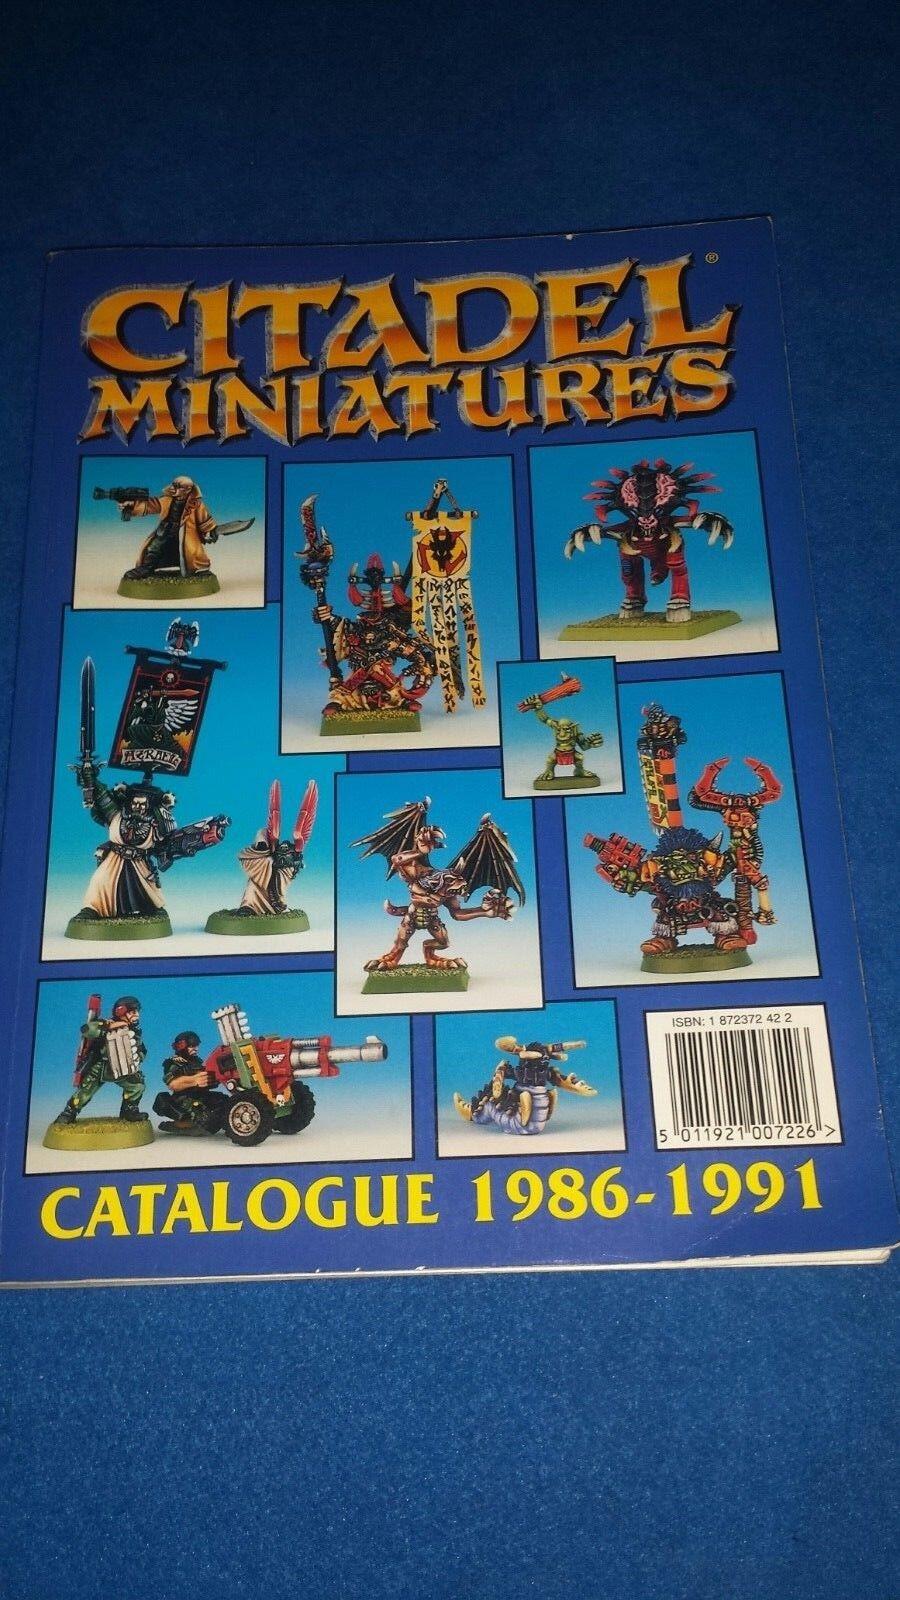 alta qualità generale Warhammer CITADEL MINIATURES MINIATURES MINIATURES CATALOGUE 1986-1991  più economico